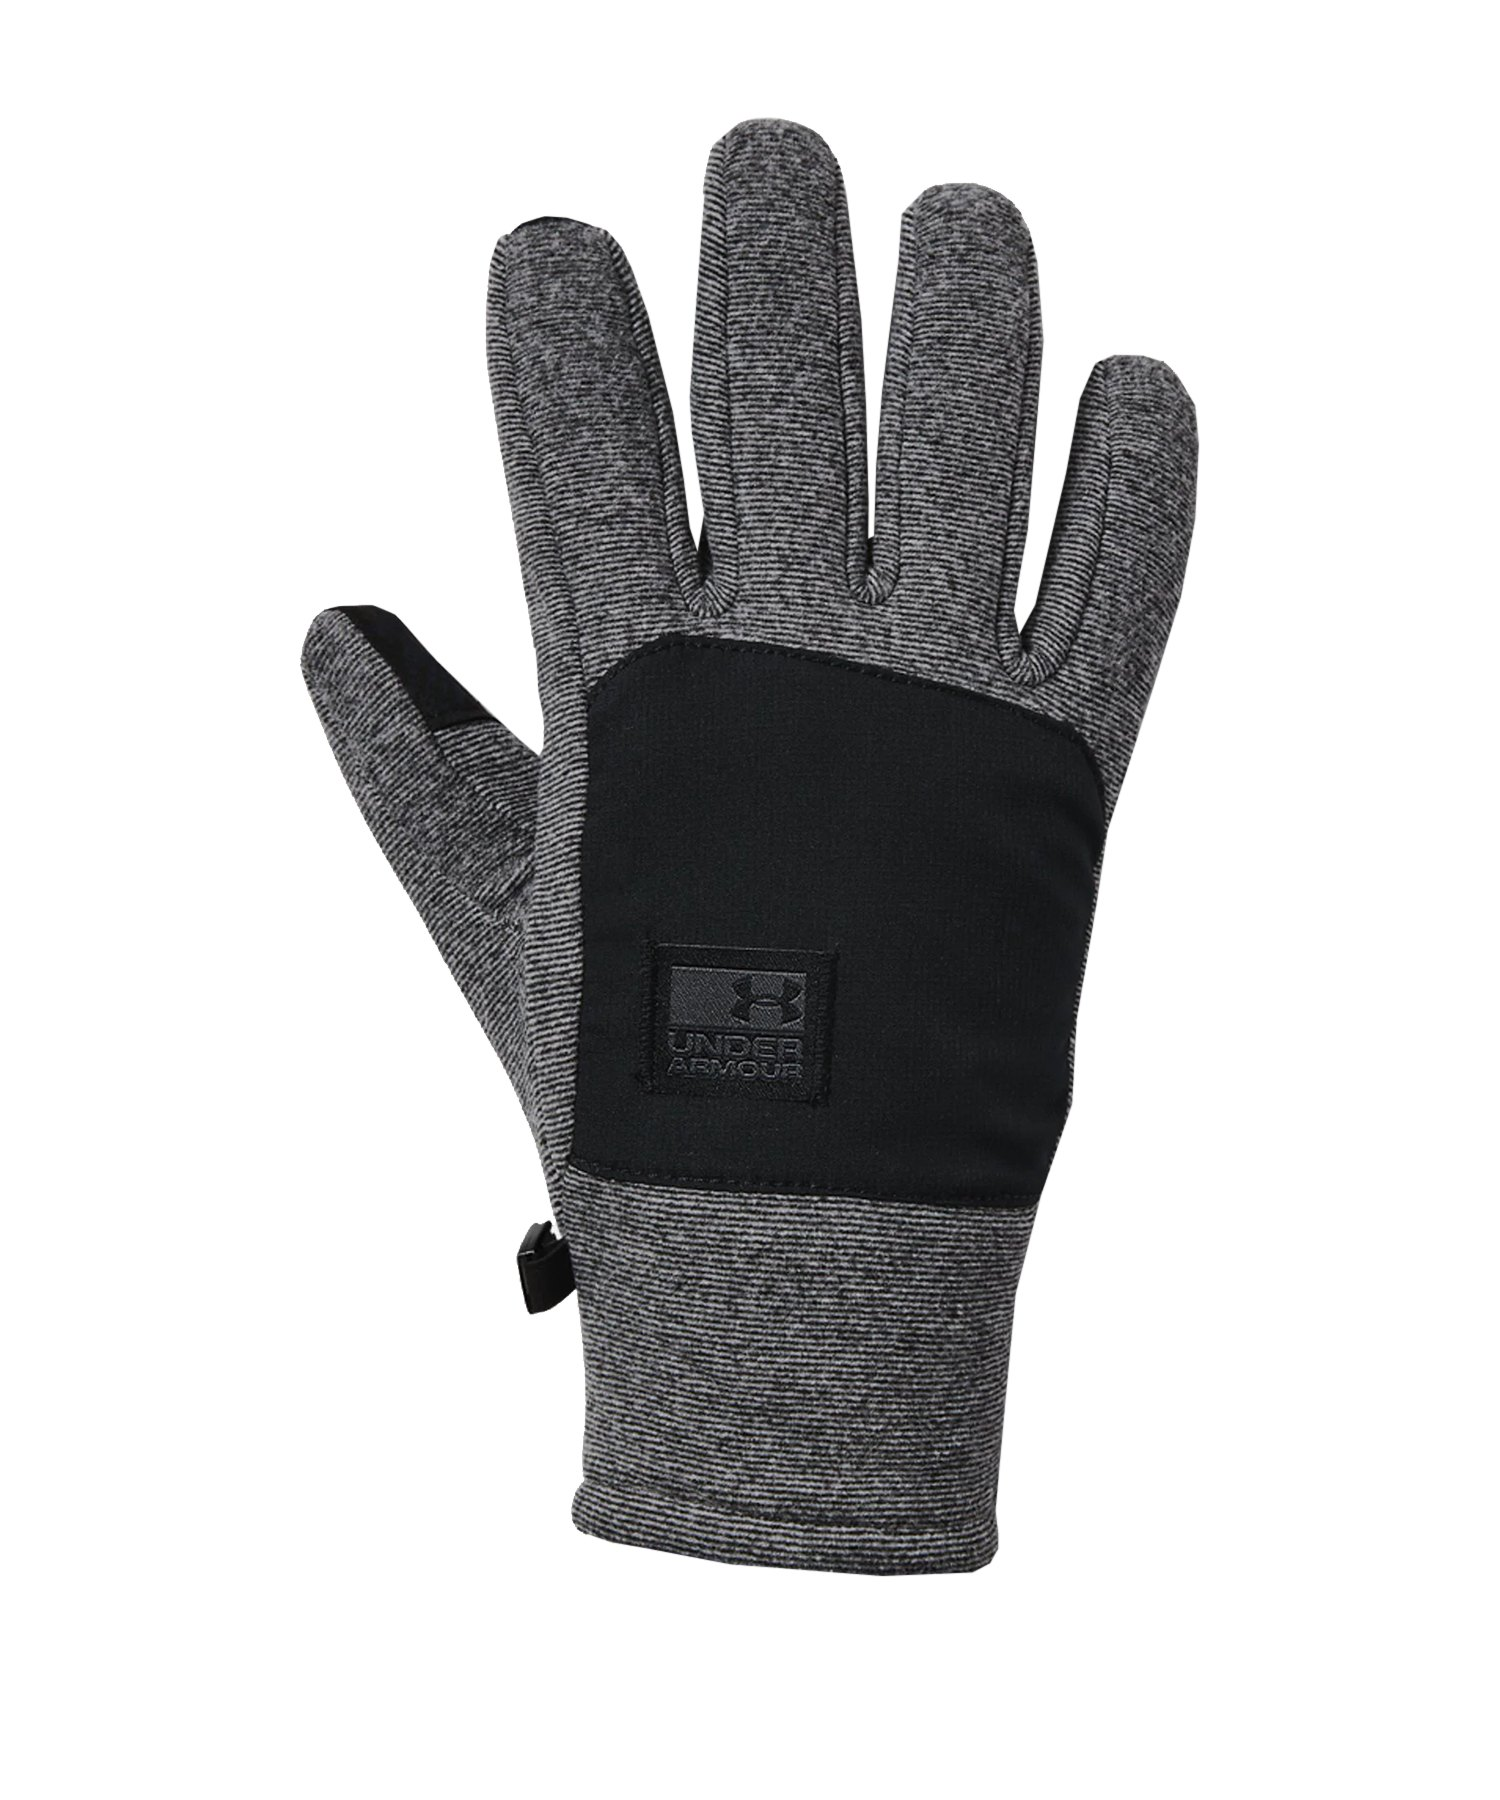 Under Armour CGI Fleece Handschuhe Schwarz F001 - schwarz